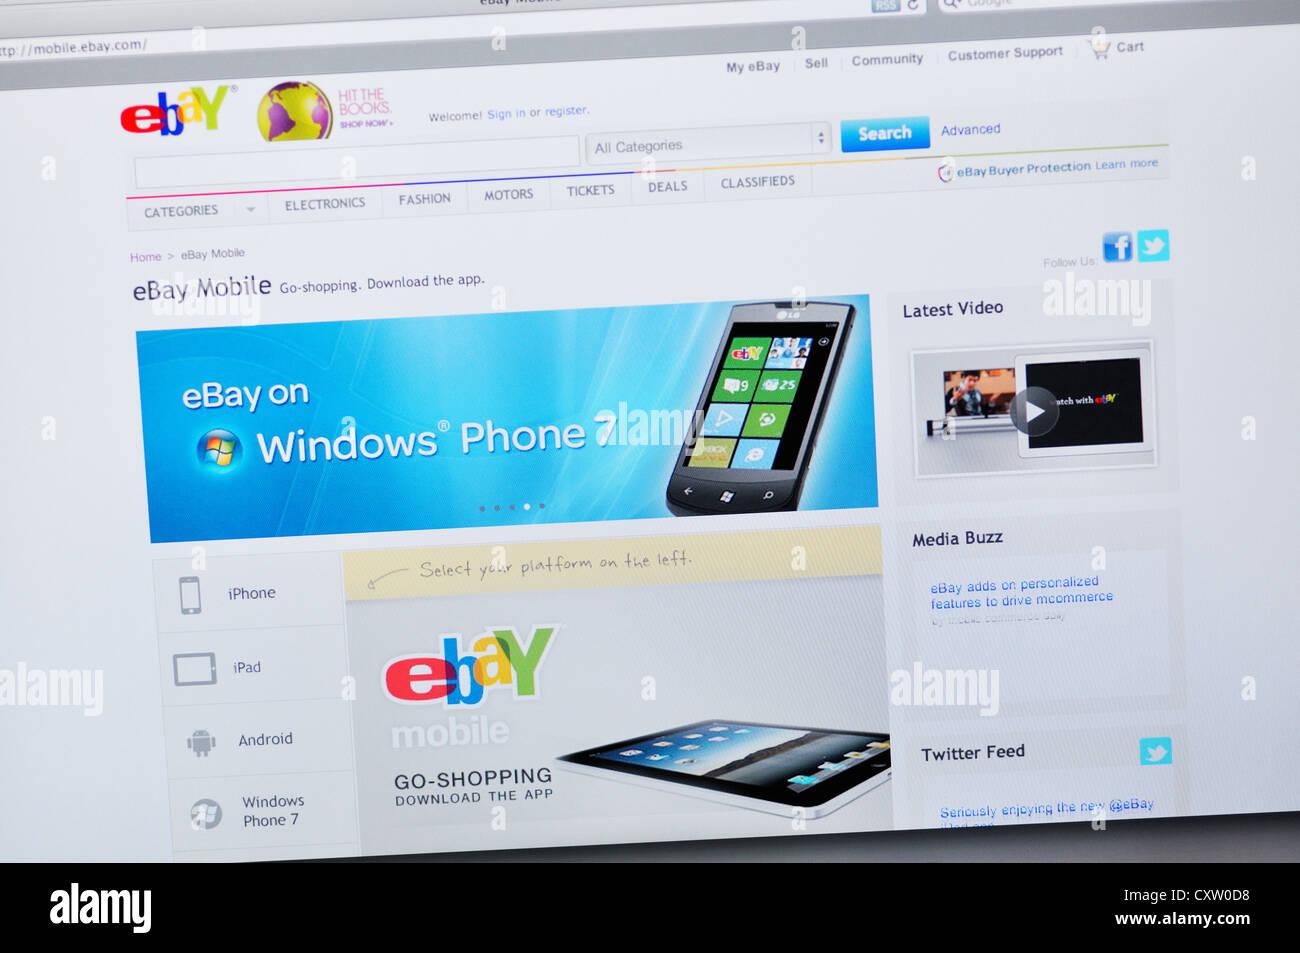 Ebay auction website - Windows Phone - Stock Image